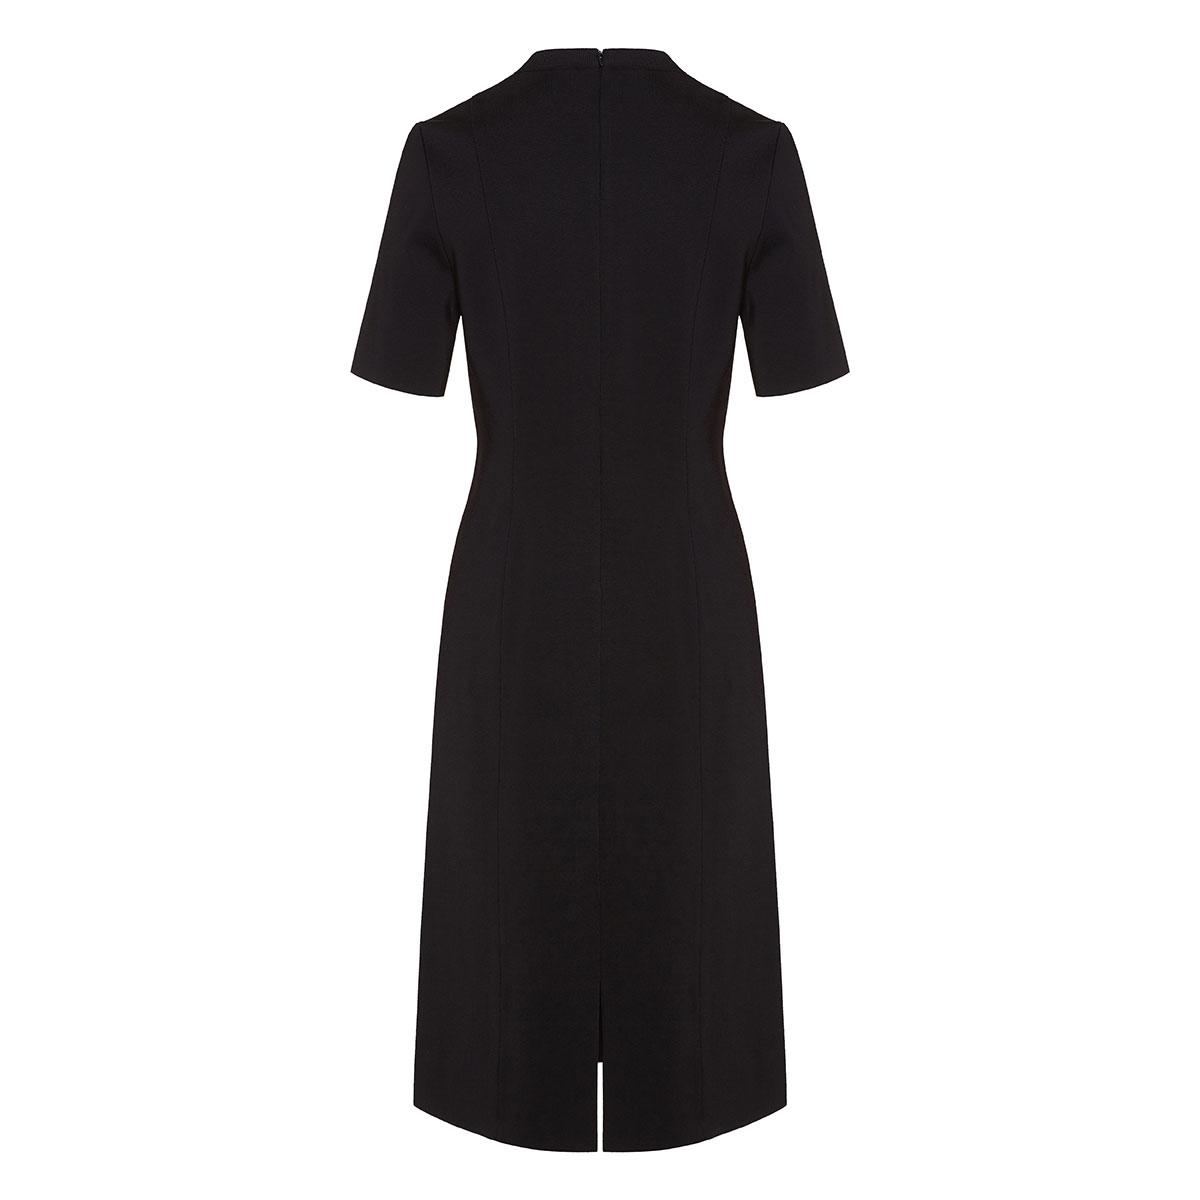 Chain-embellished midi dress